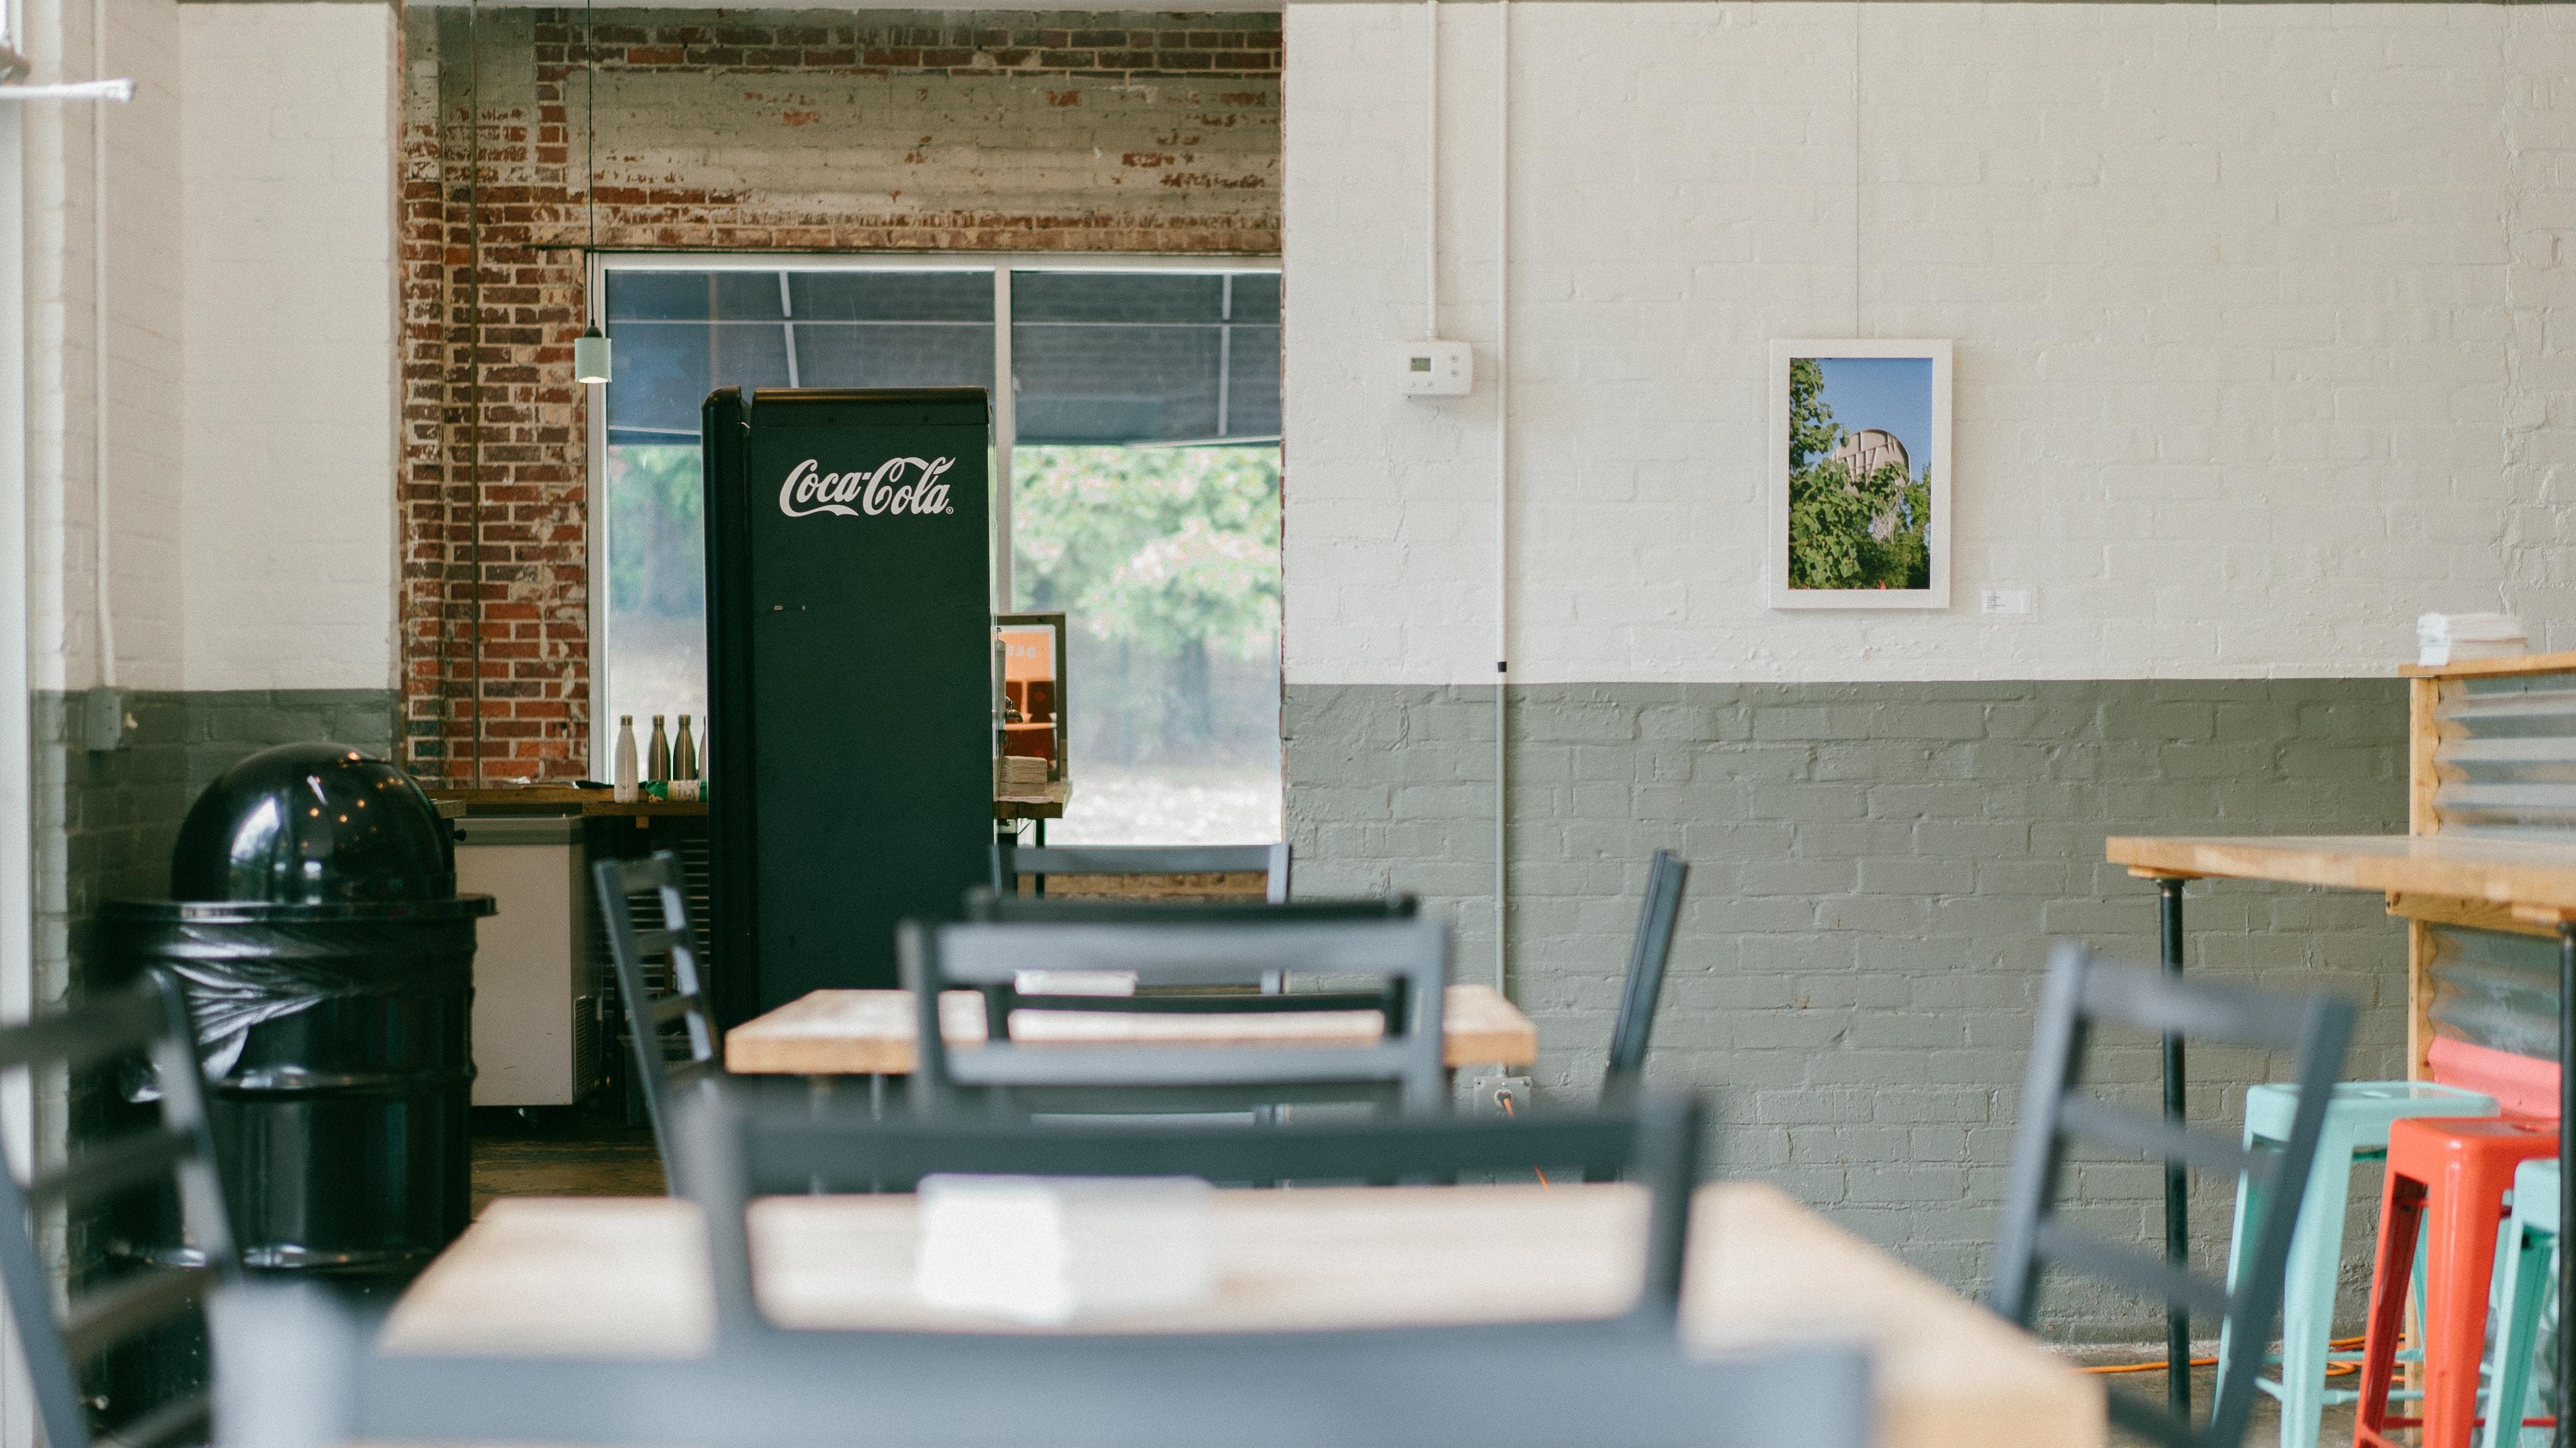 depth of field photo of Coca-Cola commercial refrigerator